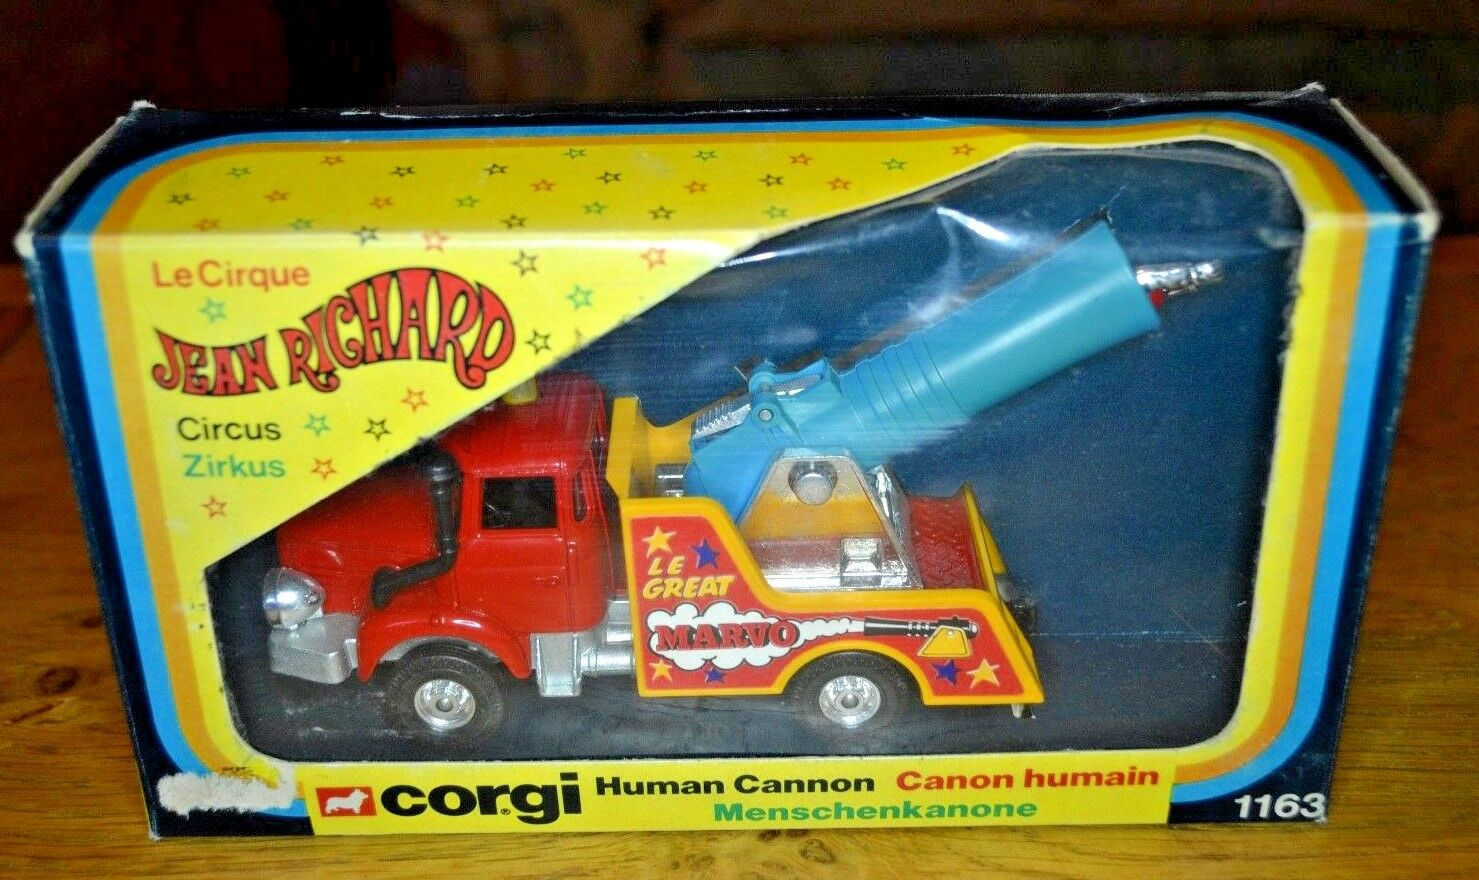 Vintage Corgi Human Cannon Jean Richard Circus No 1163